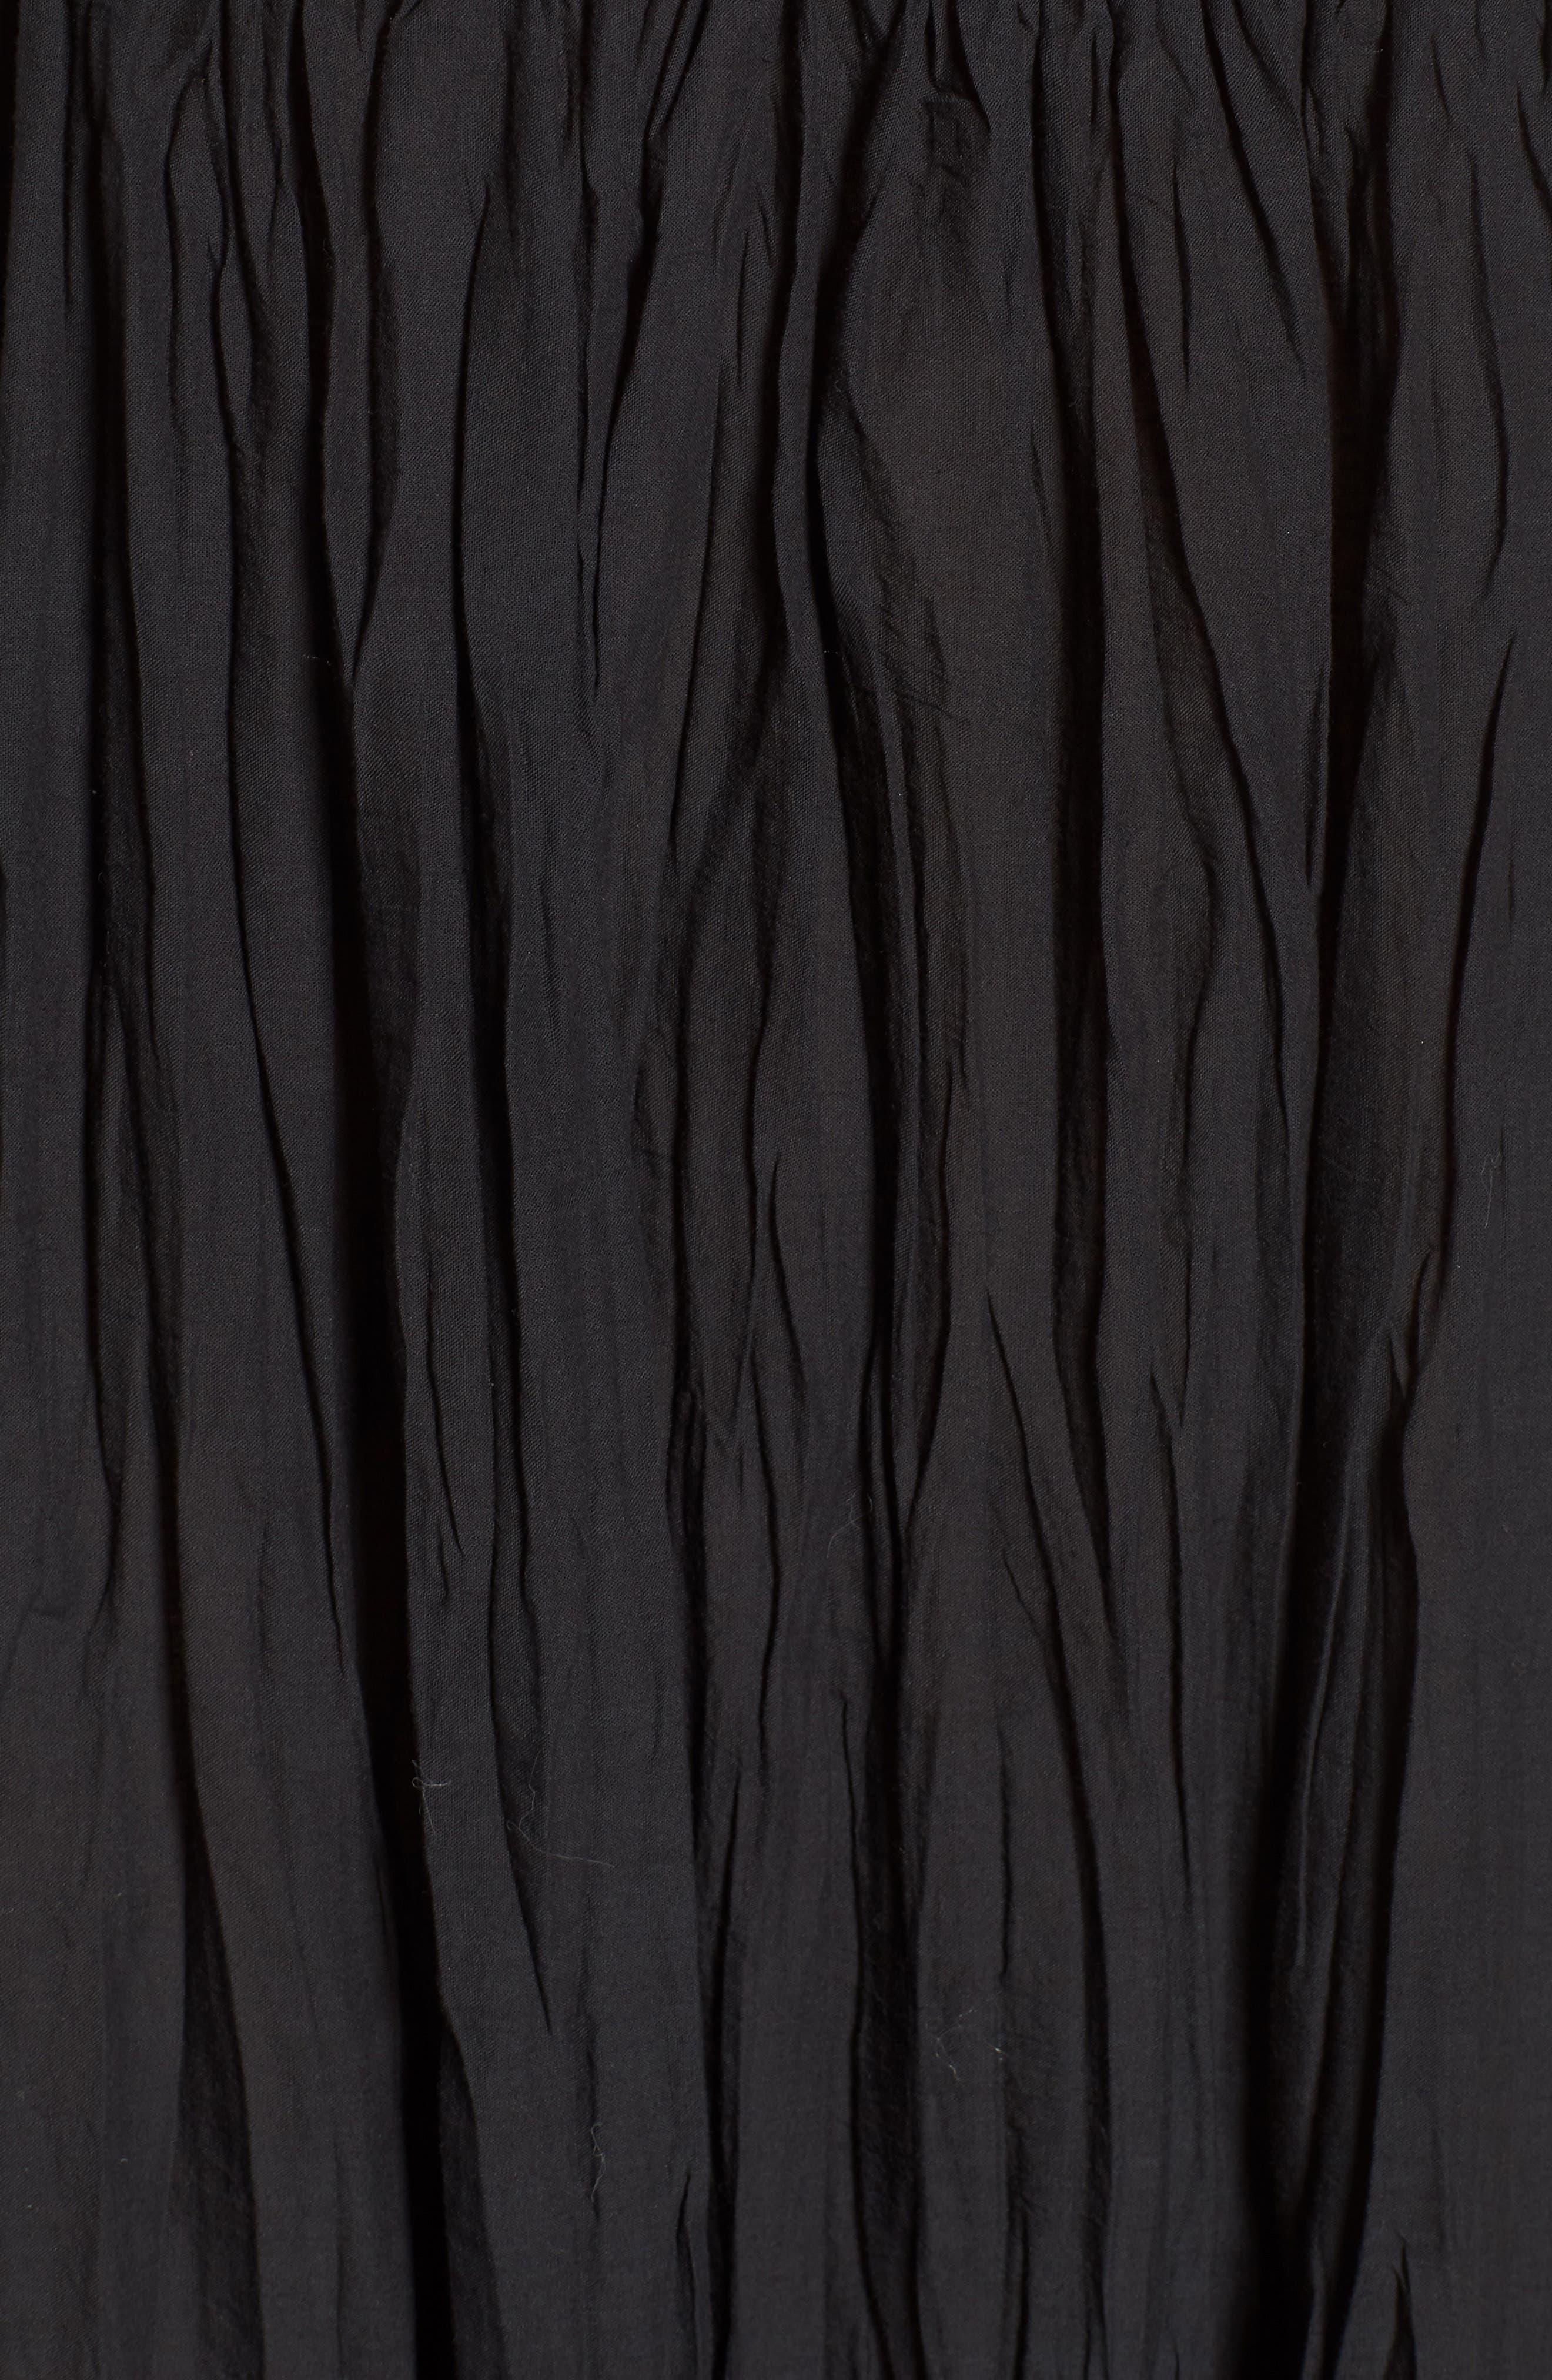 Drop It Sundress,                             Alternate thumbnail 5, color,                             Black